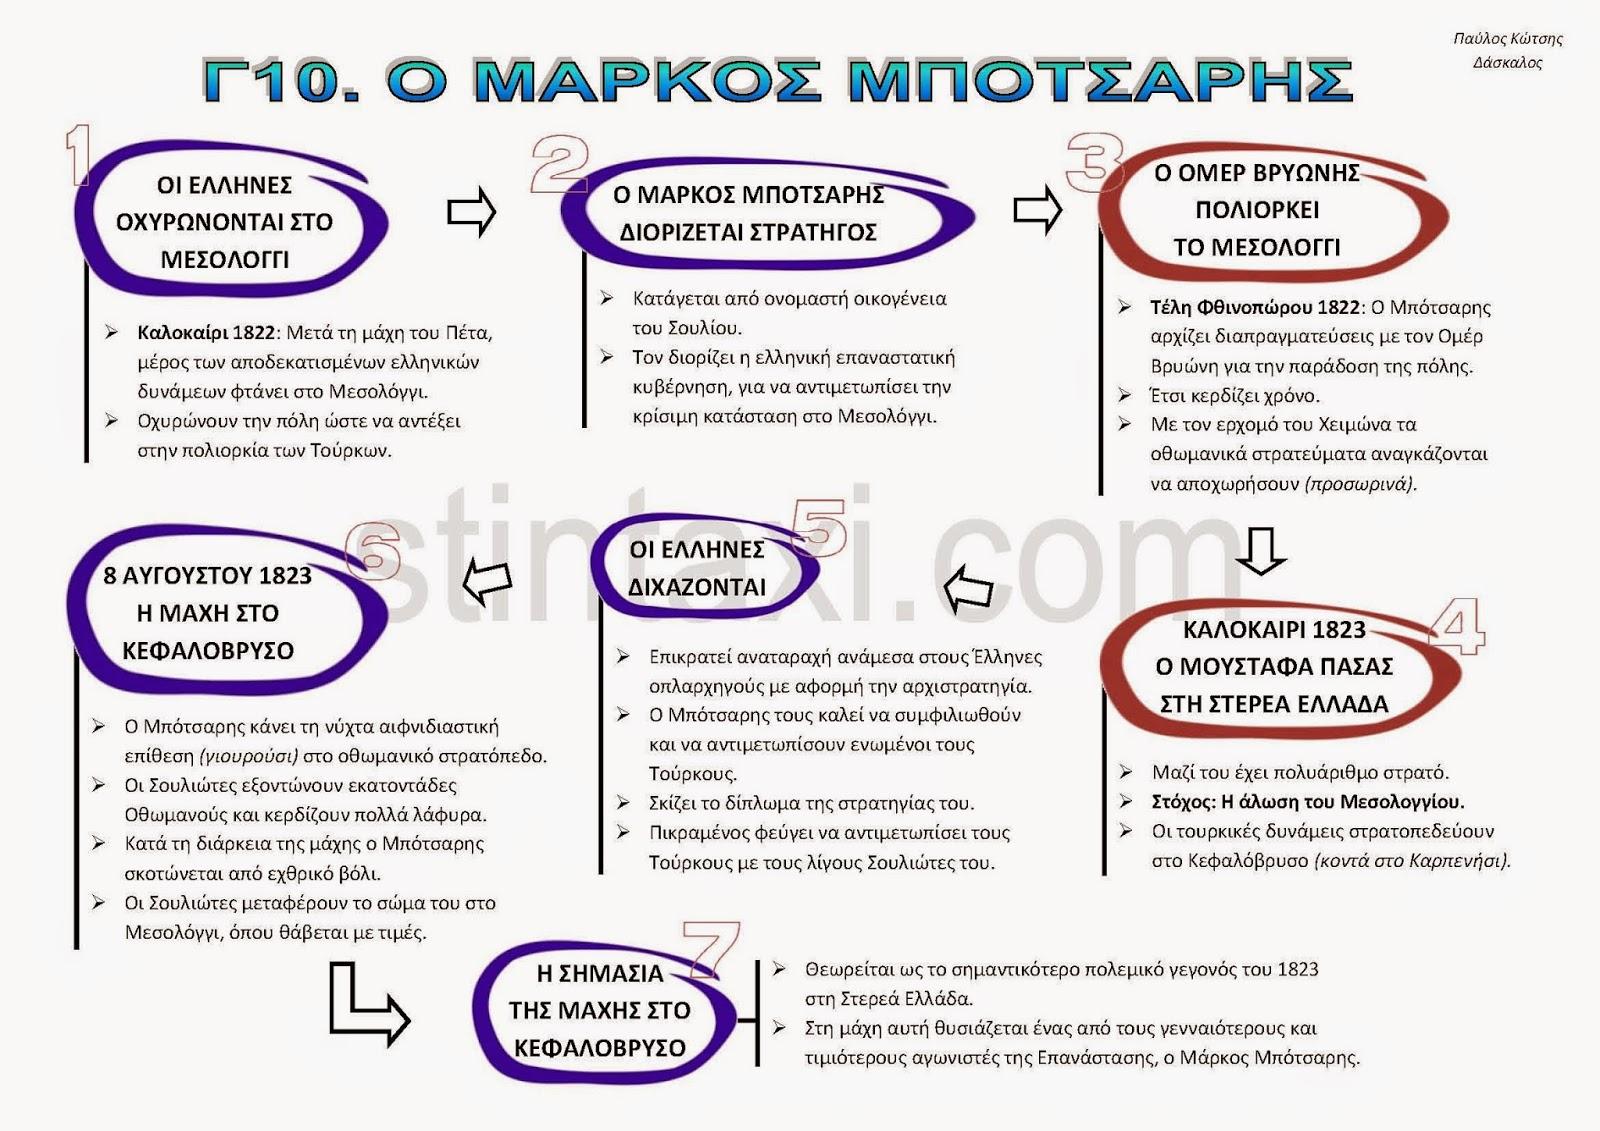 http://www.stintaxi.com/uploads/1/3/1/0/13100858/c10-markos-botsaris-v2.1.pdf